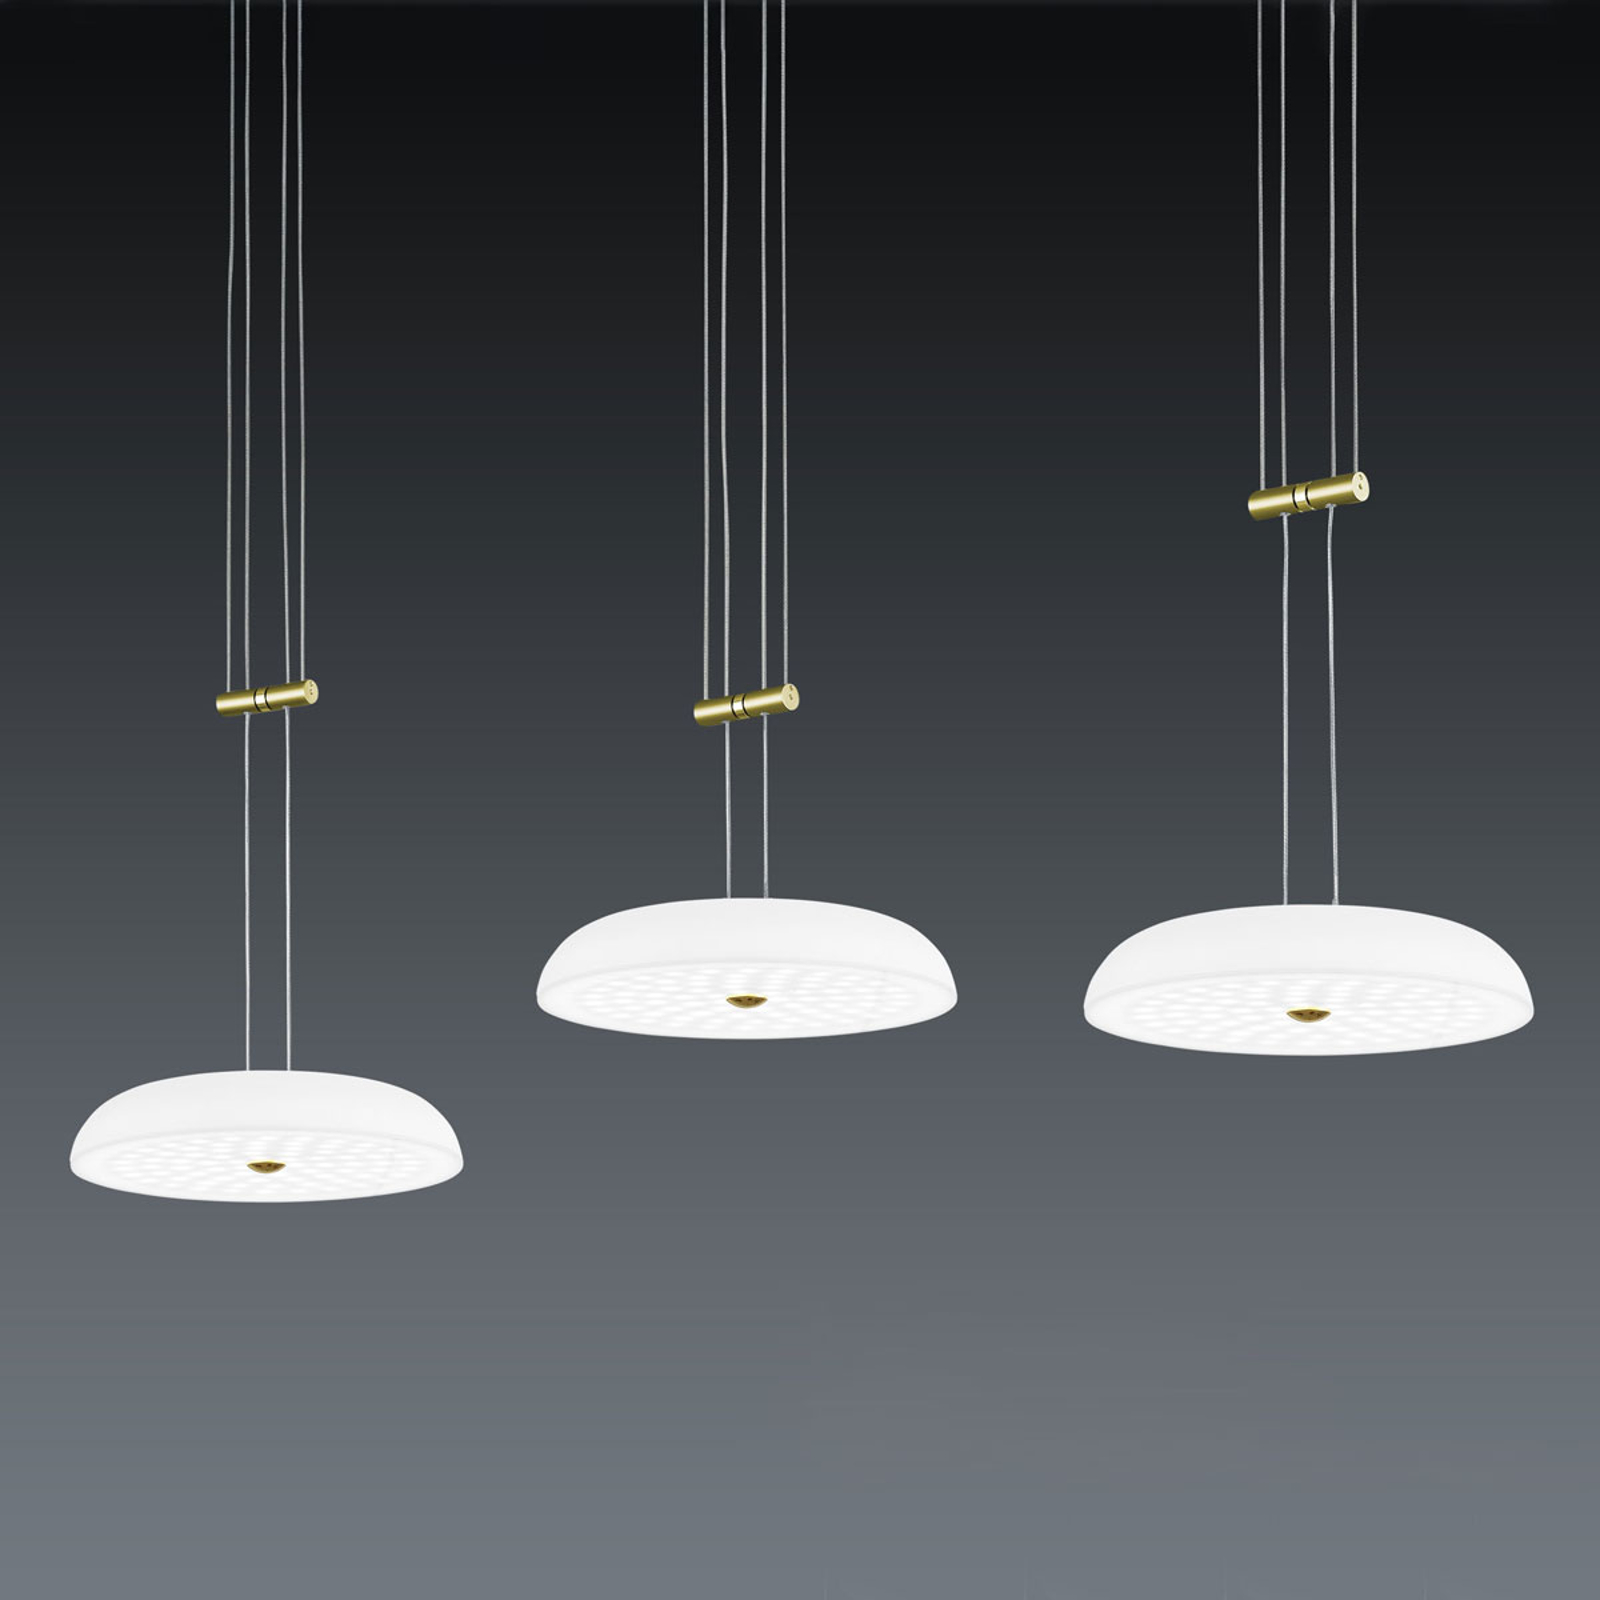 BANKAMP Vanity lampa wisząca 3-pkt. mosiądz